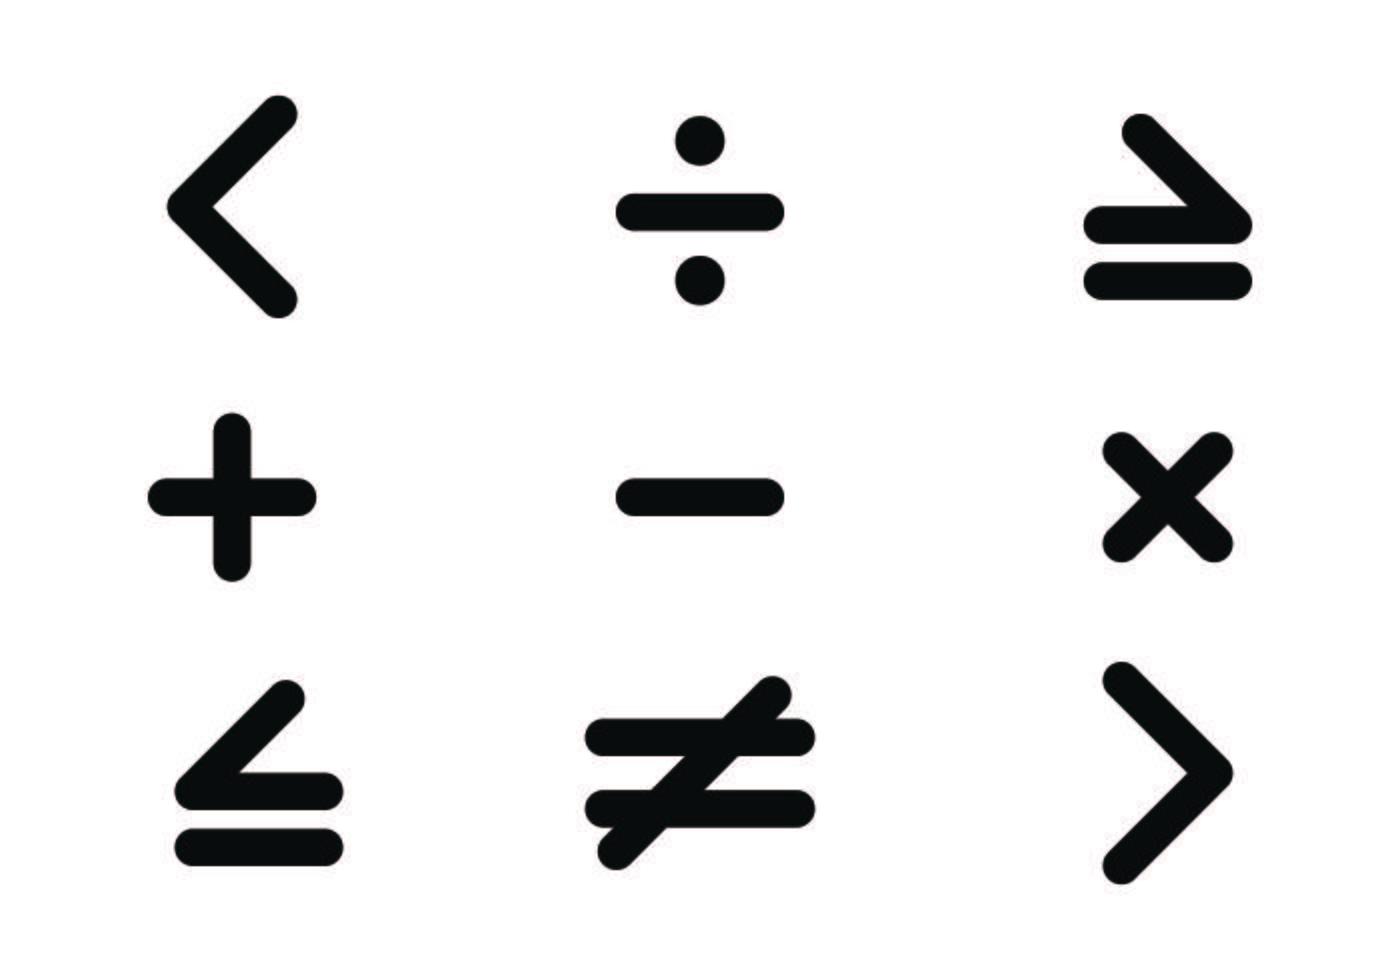 List of mathematical symbols simple english wikipedia 9848958 list of mathematical symbols simple english wikipedialist of mathematical symbols wikipediacategorymathematical notation simple english wikipedia list of biocorpaavc Gallery